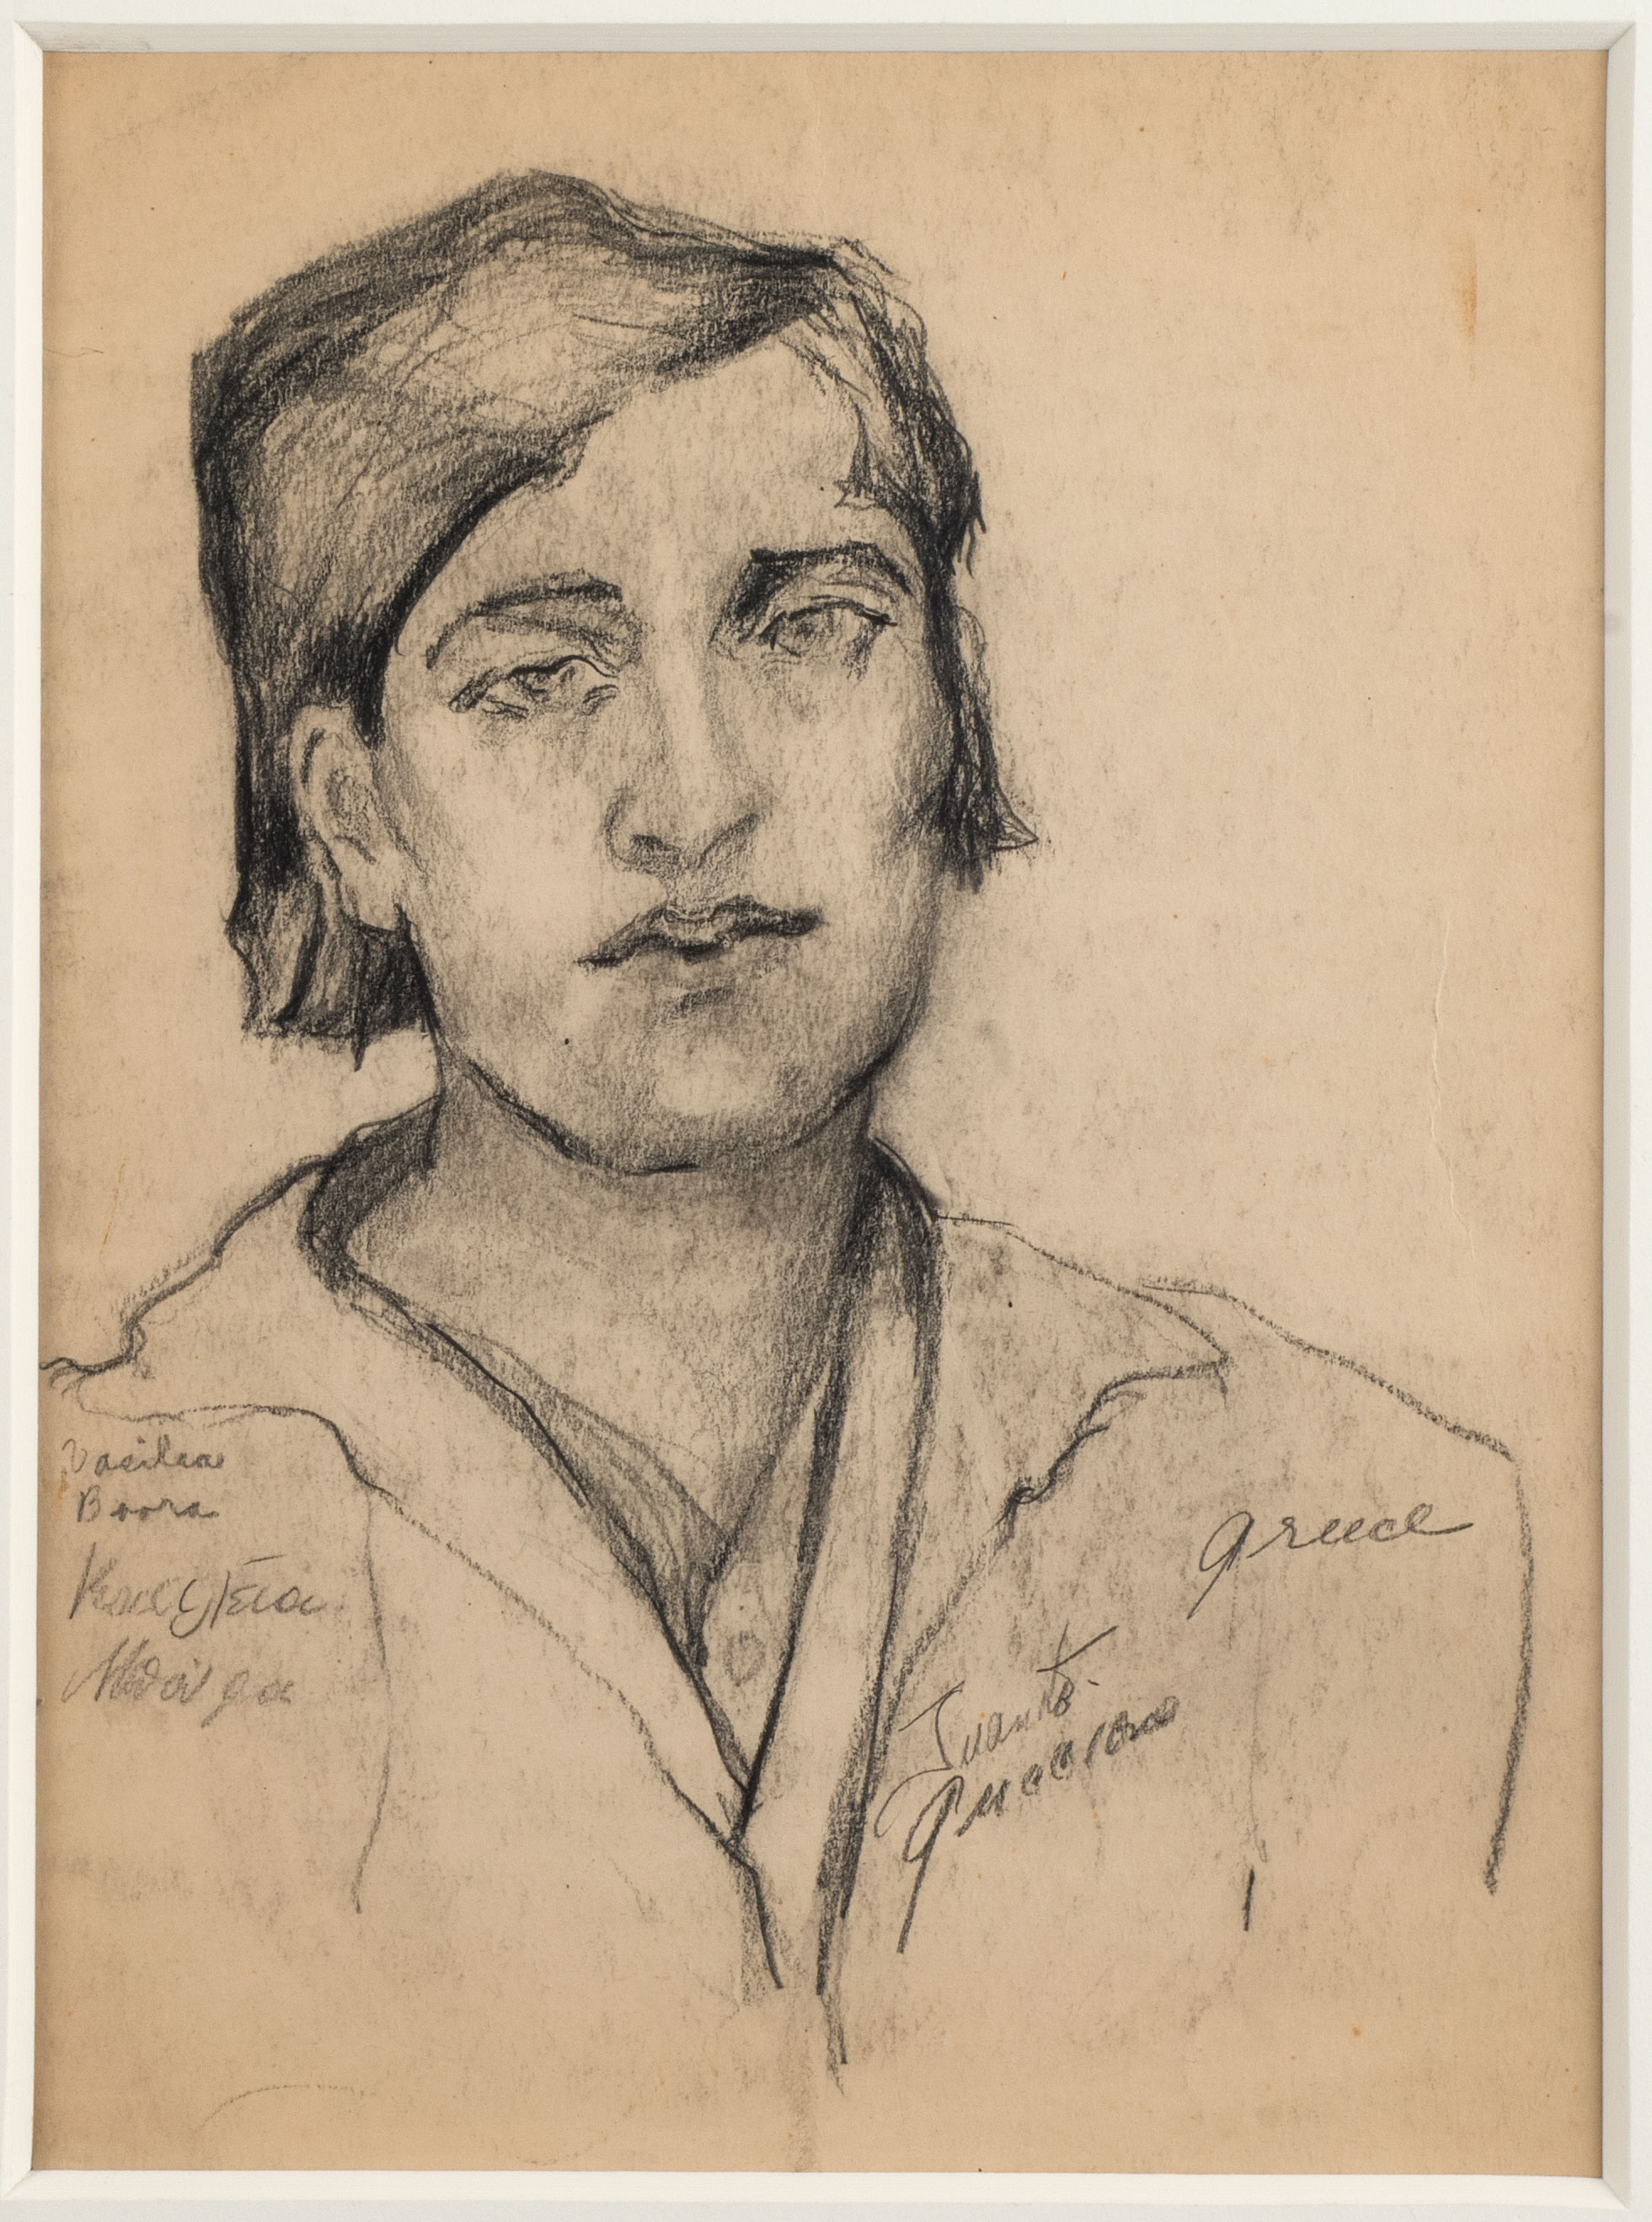 Head of a Woman (Greece, Vasilia Boorea),n.d.,Pencil on paper, 11 1/2 x 8 1/2,$ 3,800 (SOLD)